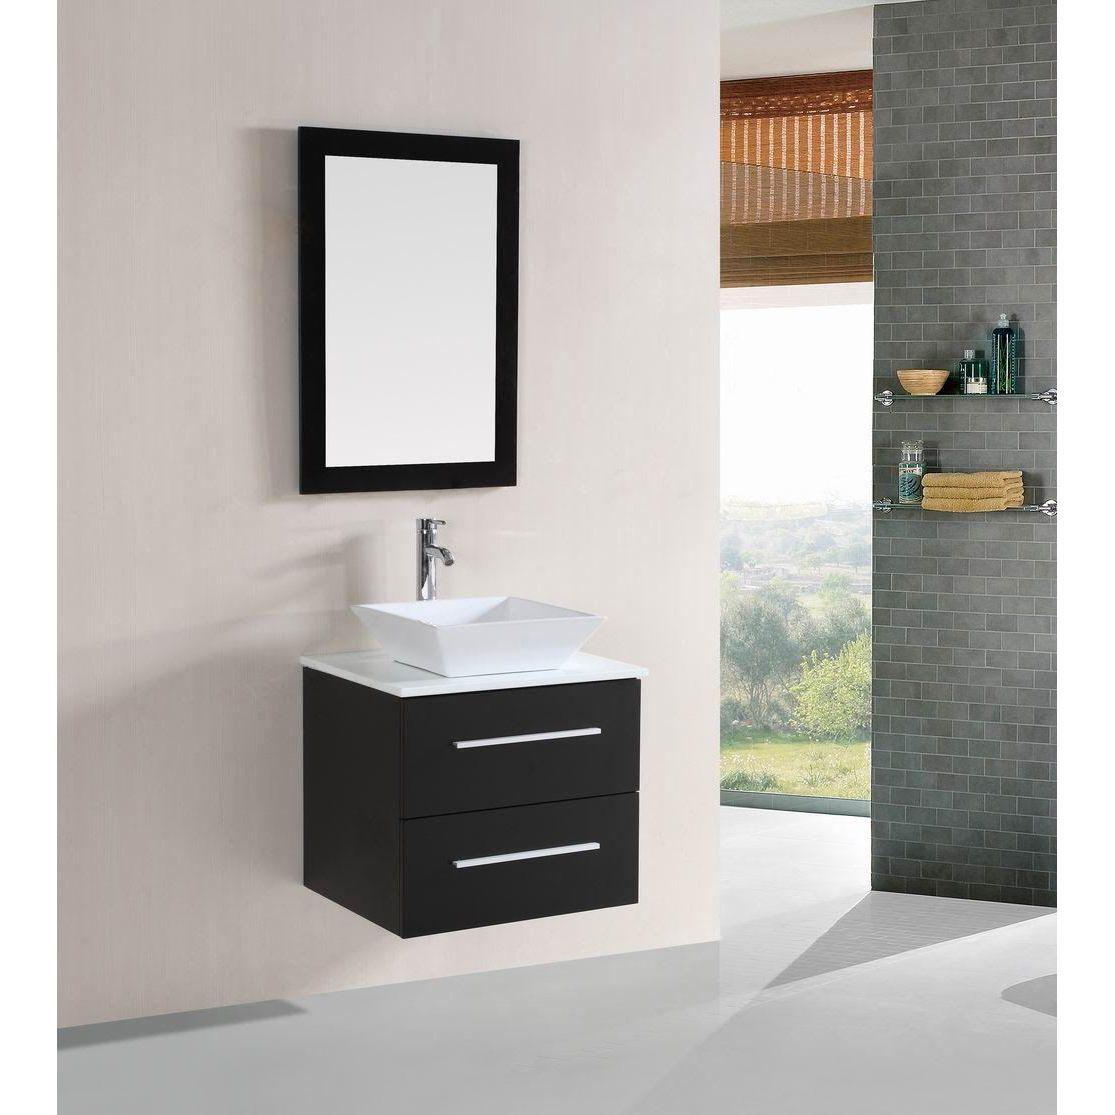 Kokols 24 Bathroom Vanity Set belvedere 24-inch modern espresso floating single sink bathroom